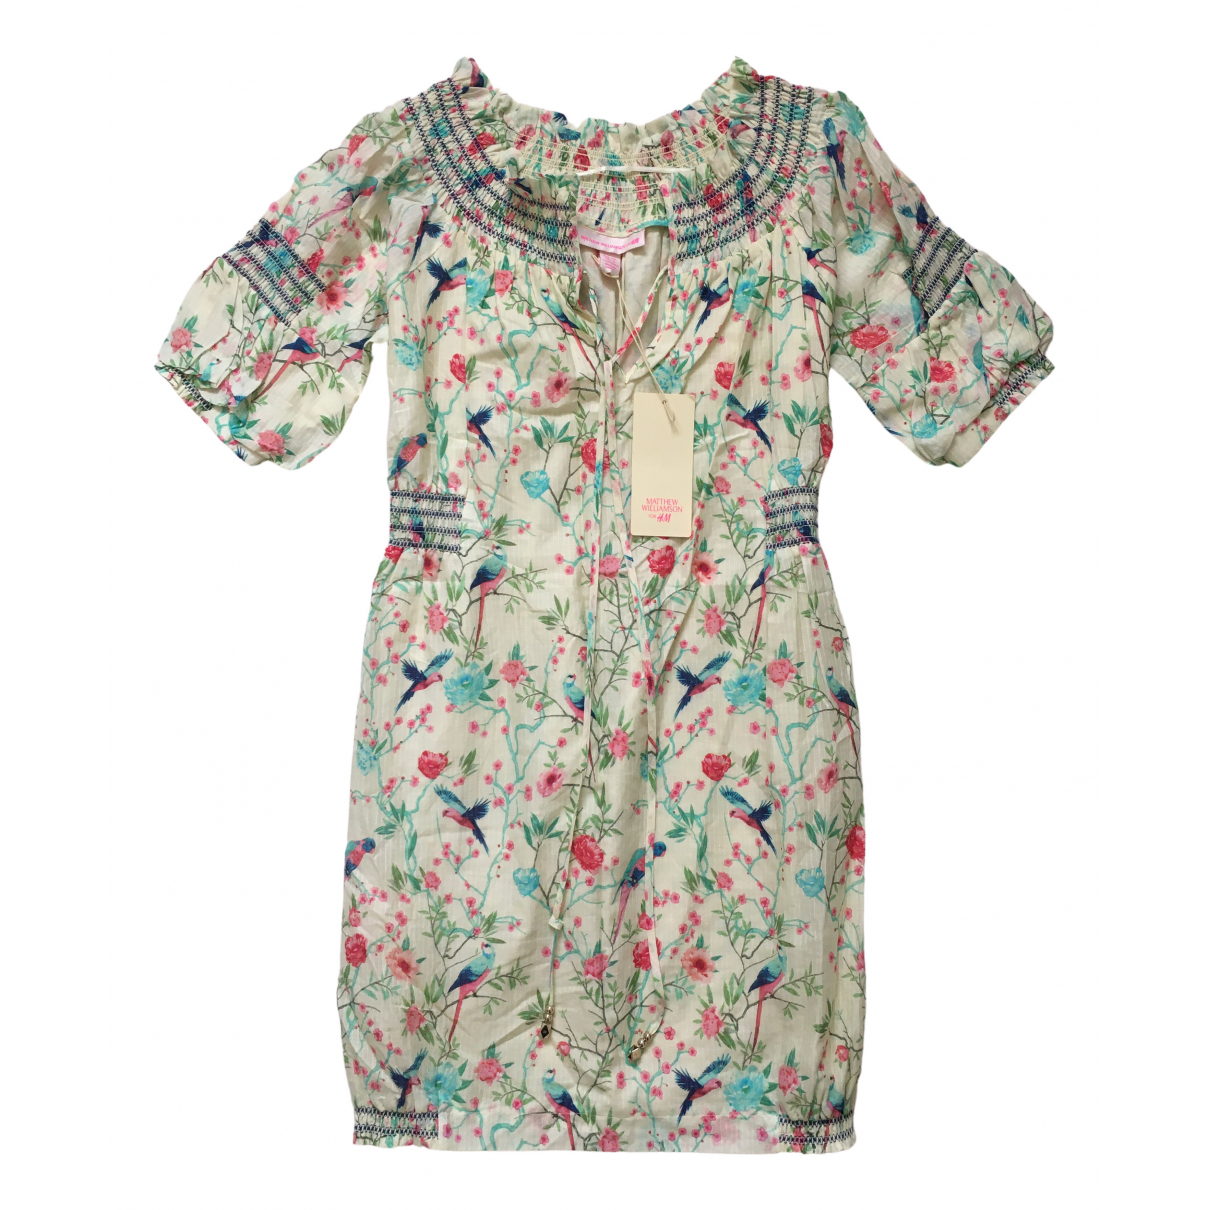 Matthew Williamson For H&m N Multicolour Cotton dress for Women 36 FR